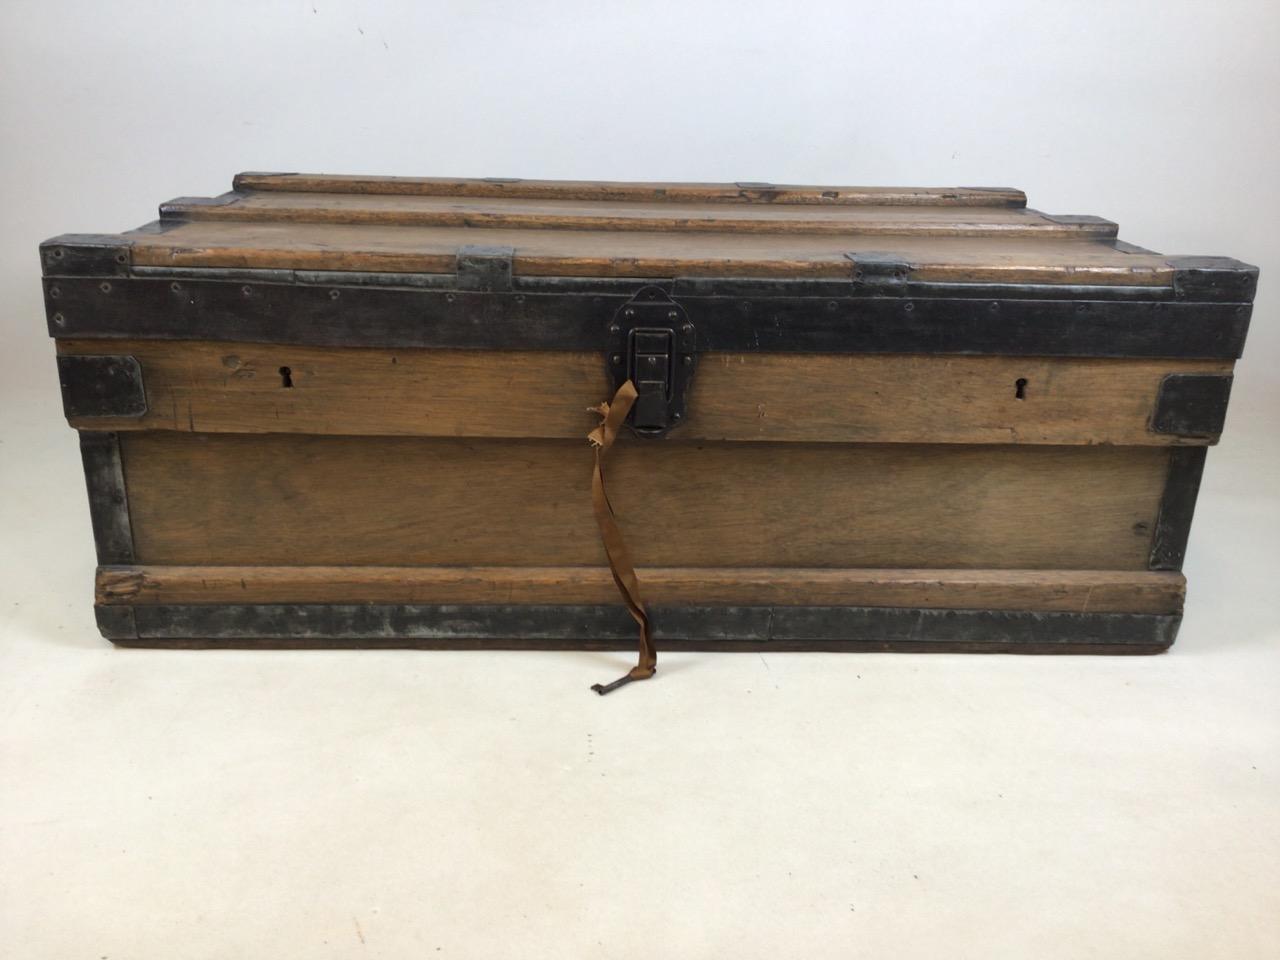 A large 19th century lead trunk with metal bound edges. W:97cm x D:60cm x H:36cm